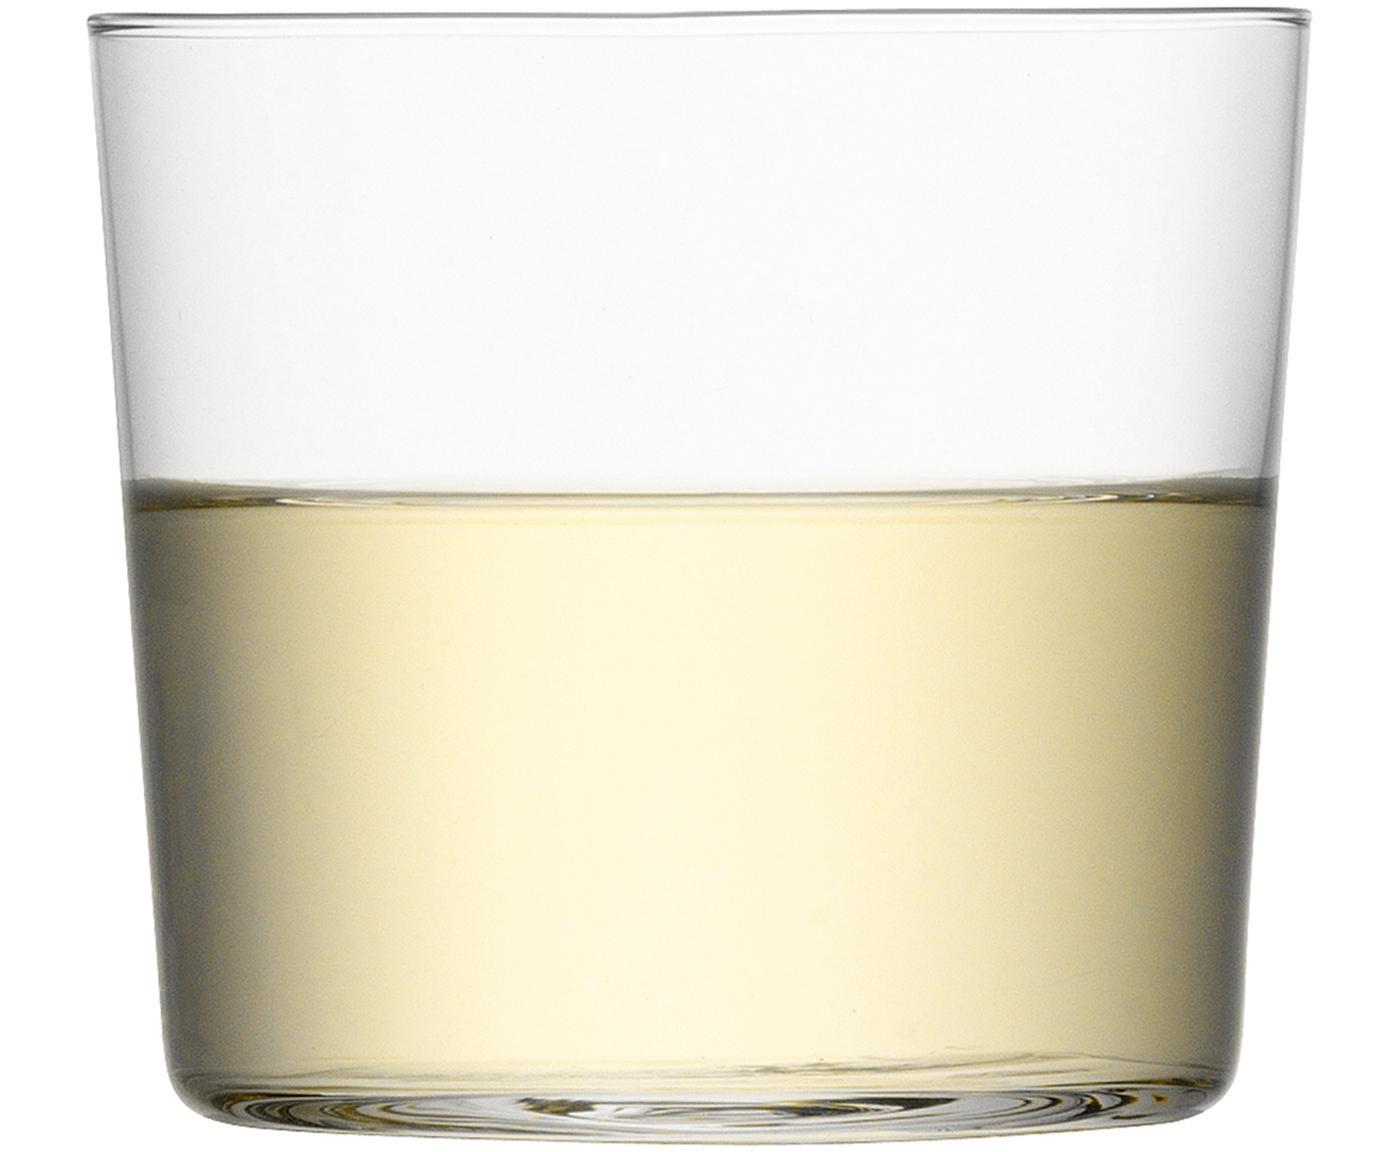 Filigrane Wassergläser Gio aus dünnem Glas, 6er-Set, Glas, Transparent, Ø 8 x H 7 cm